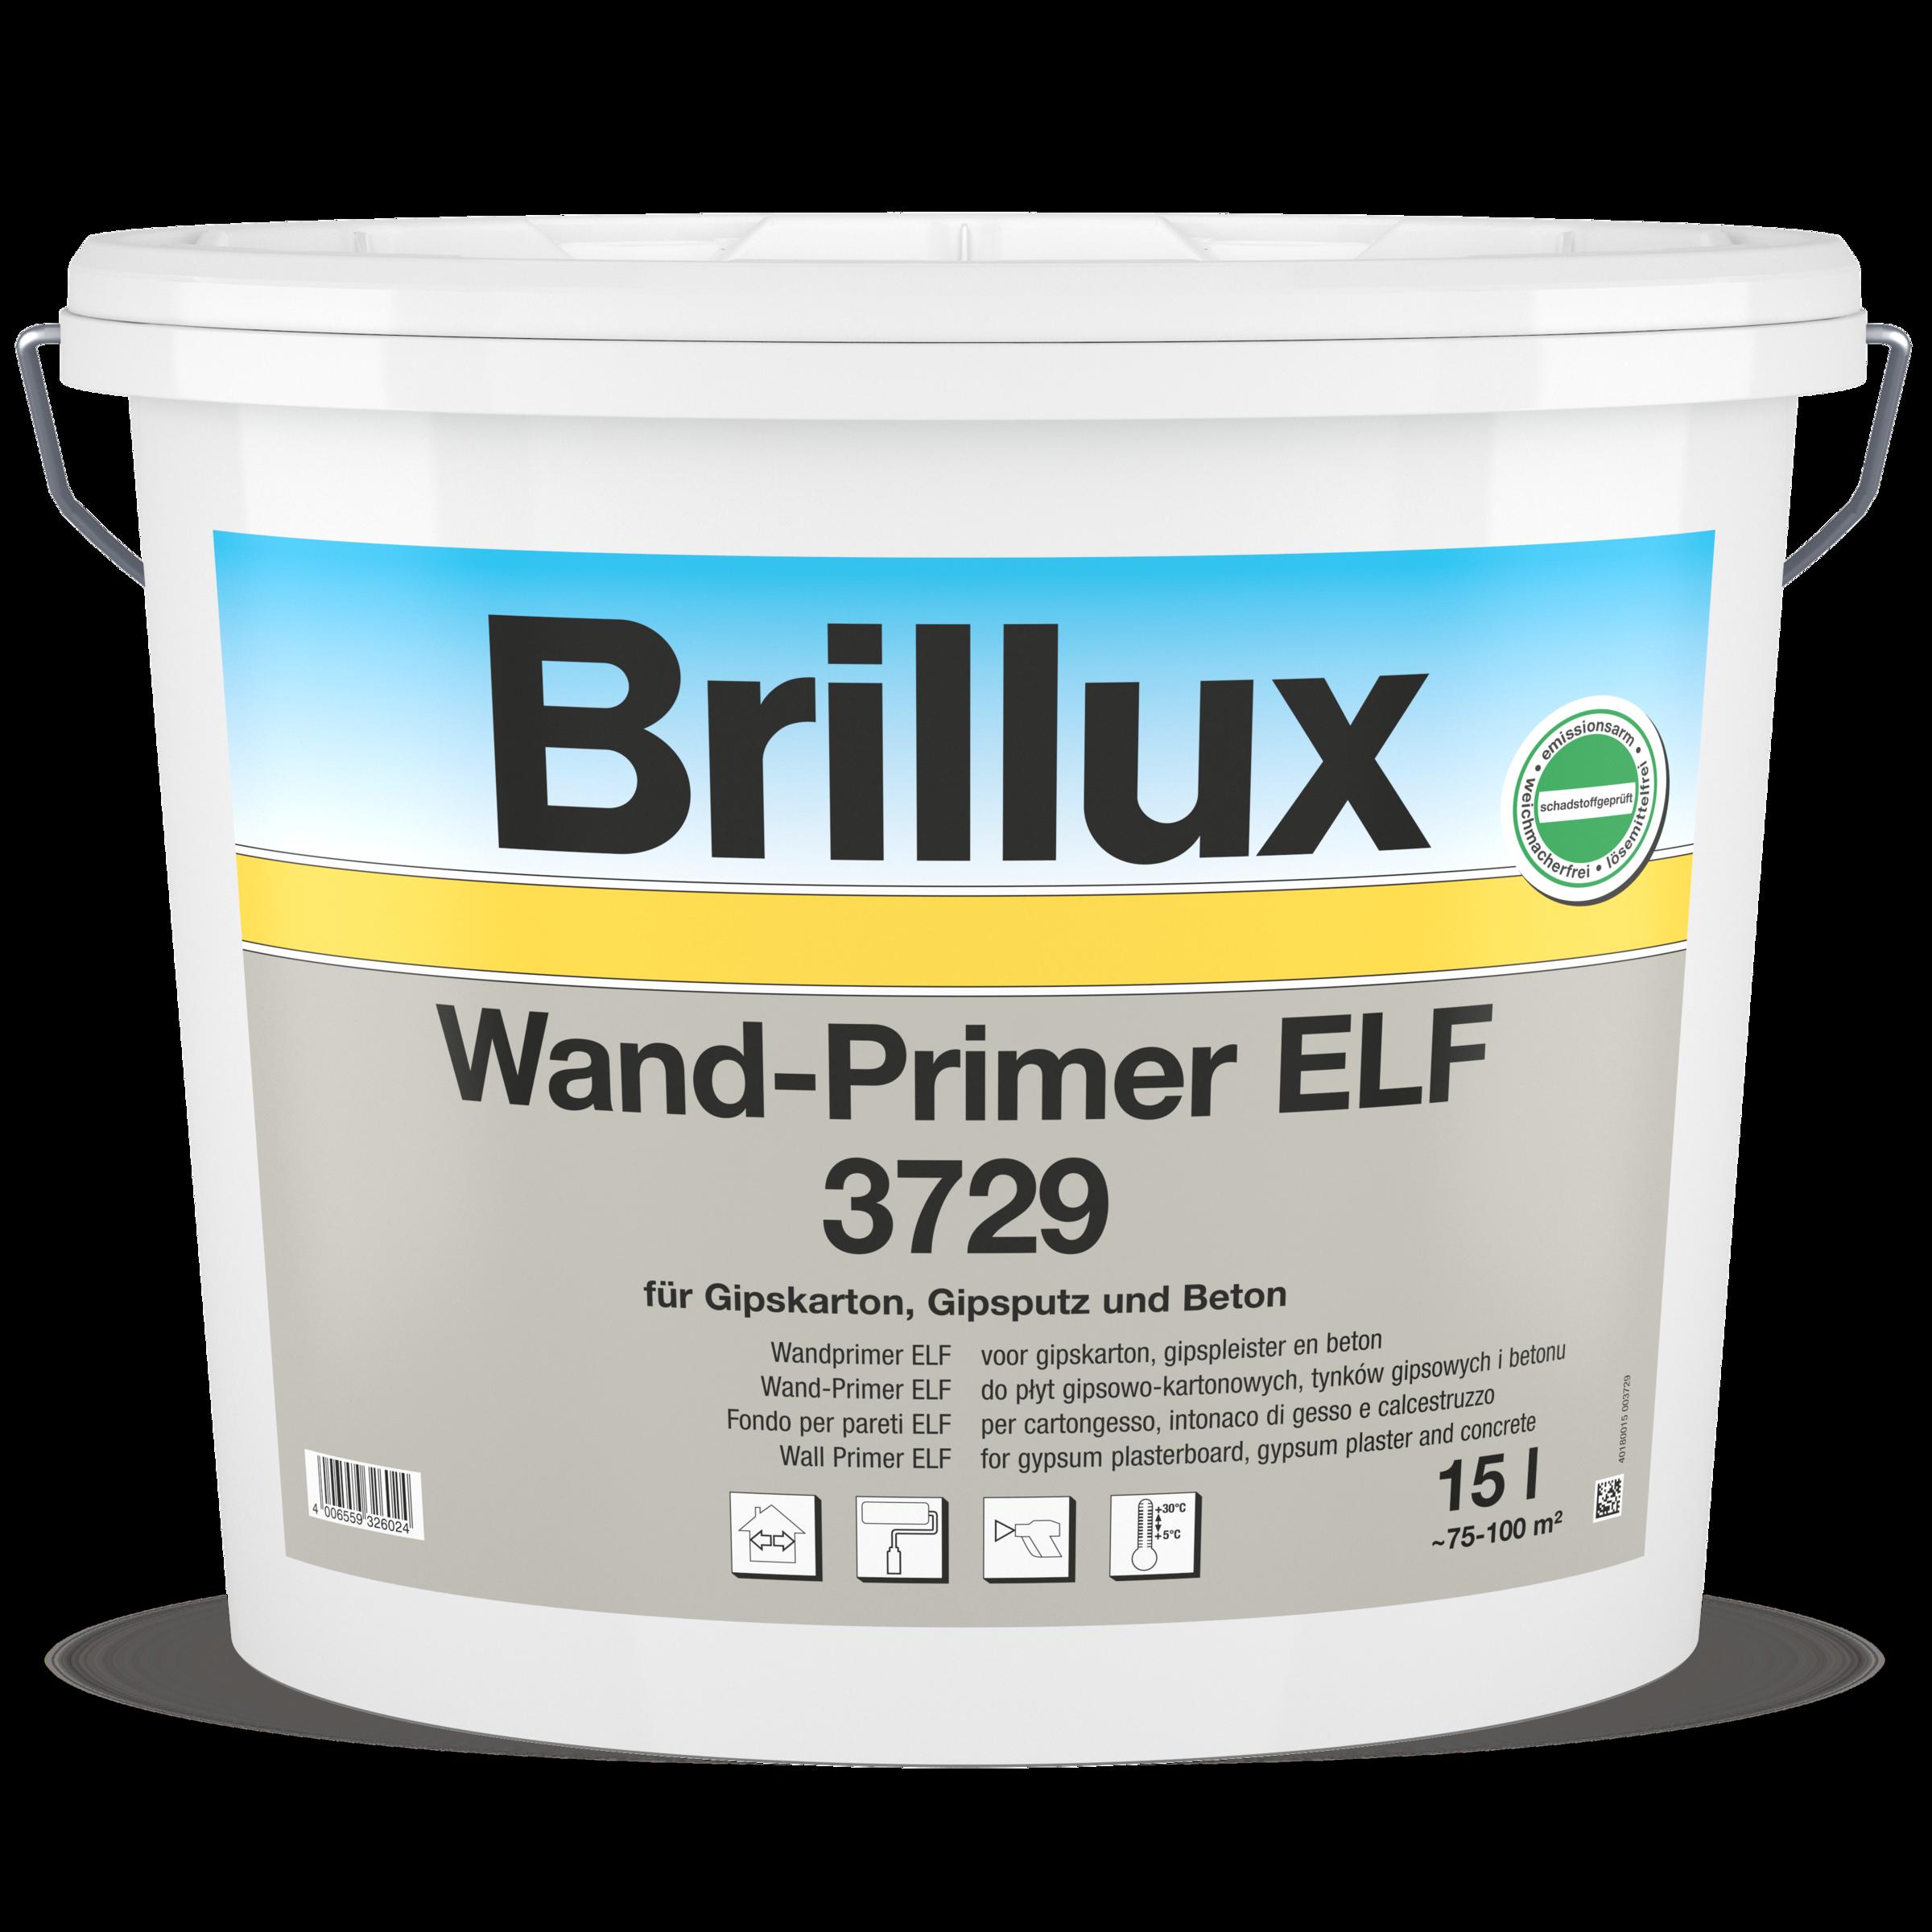 Wand-Primer ELF 3729